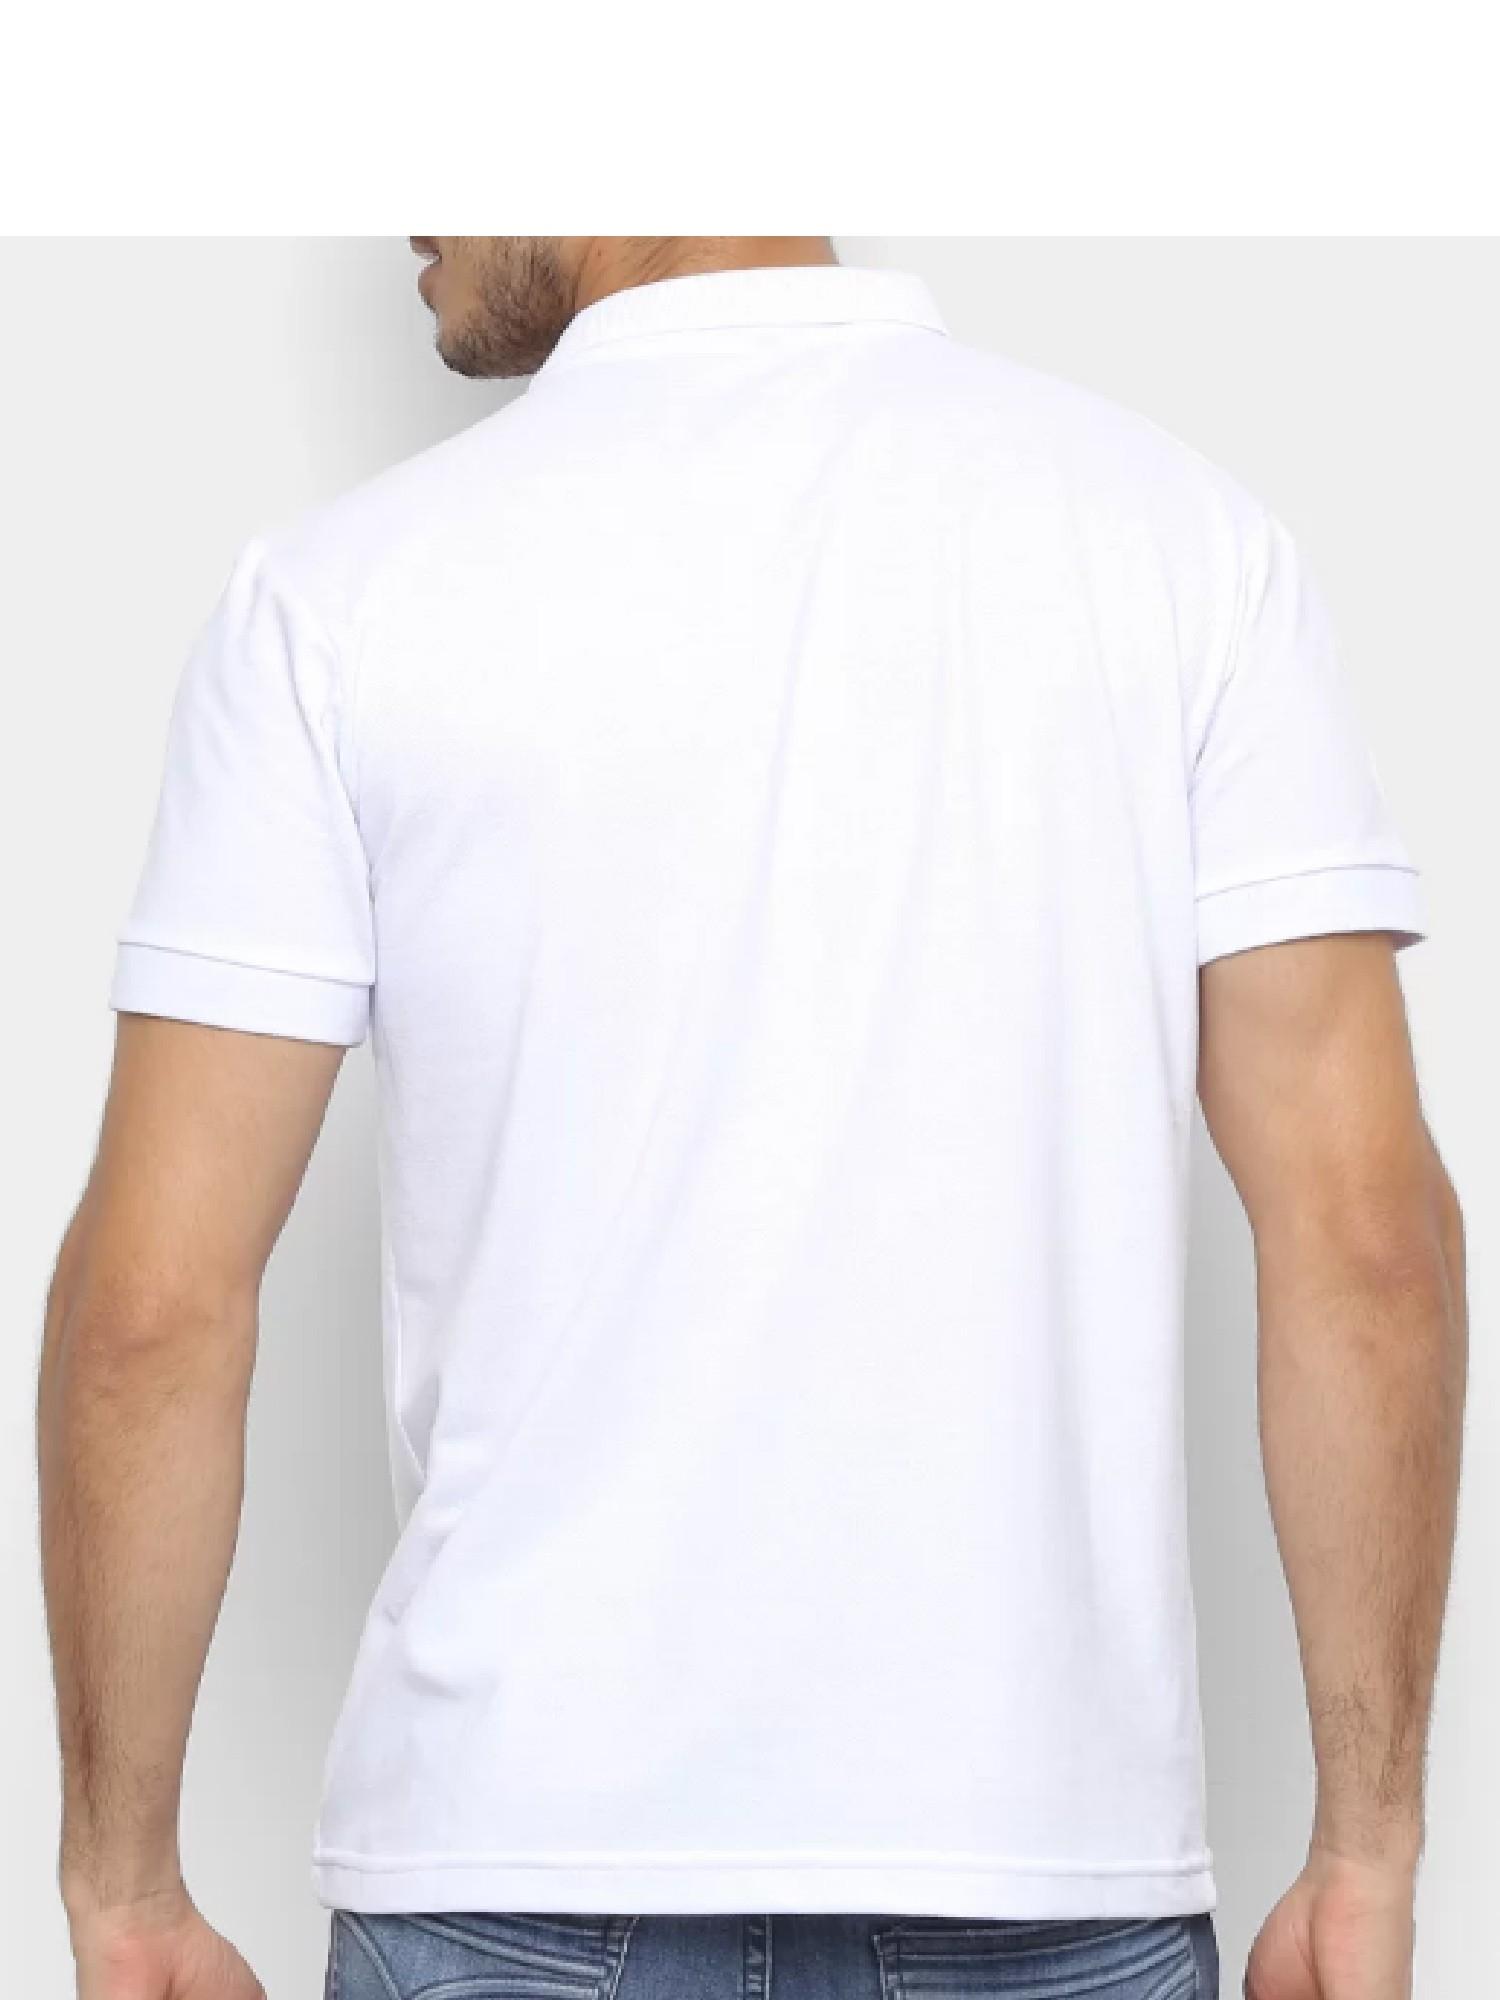 Camisa Polo Masculina Wrangler 20x Collection Ref. WM58519BR